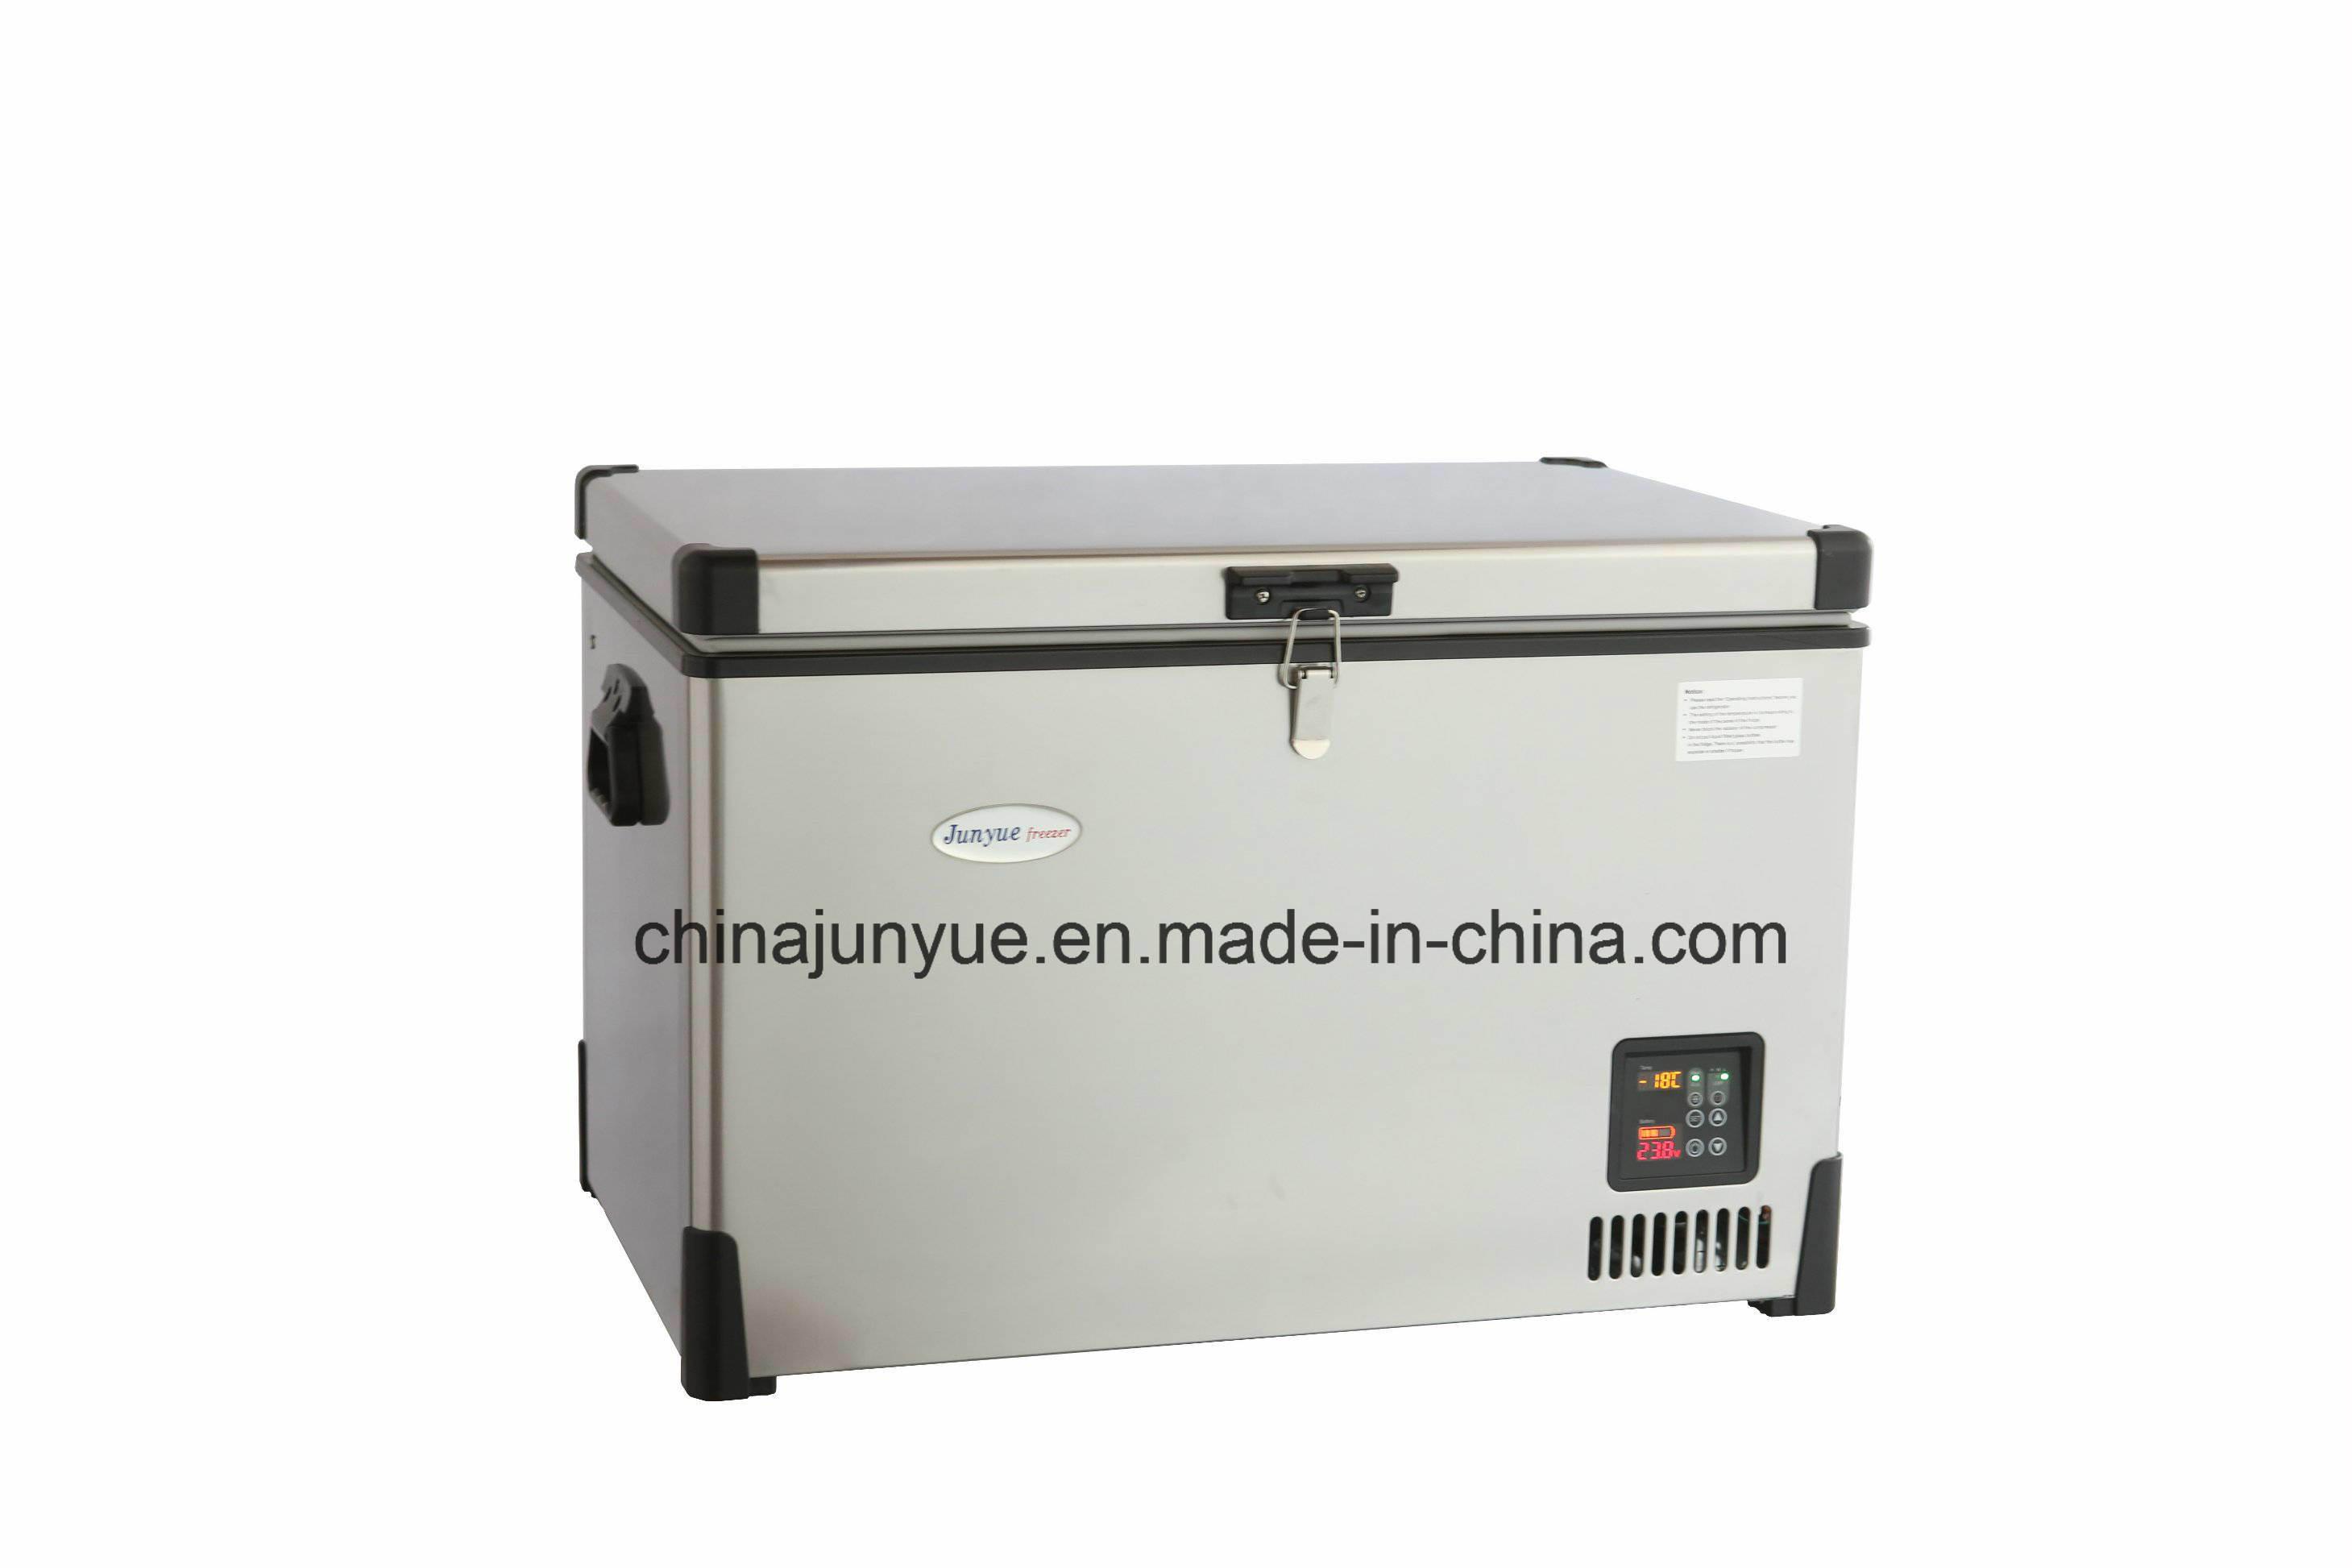 12V 24V DC Container Freezer Solar Refrigerator Fridge 12V DC Stainless Steel Freezer Deep Freezer Refrigerator Bd/Bc-92L